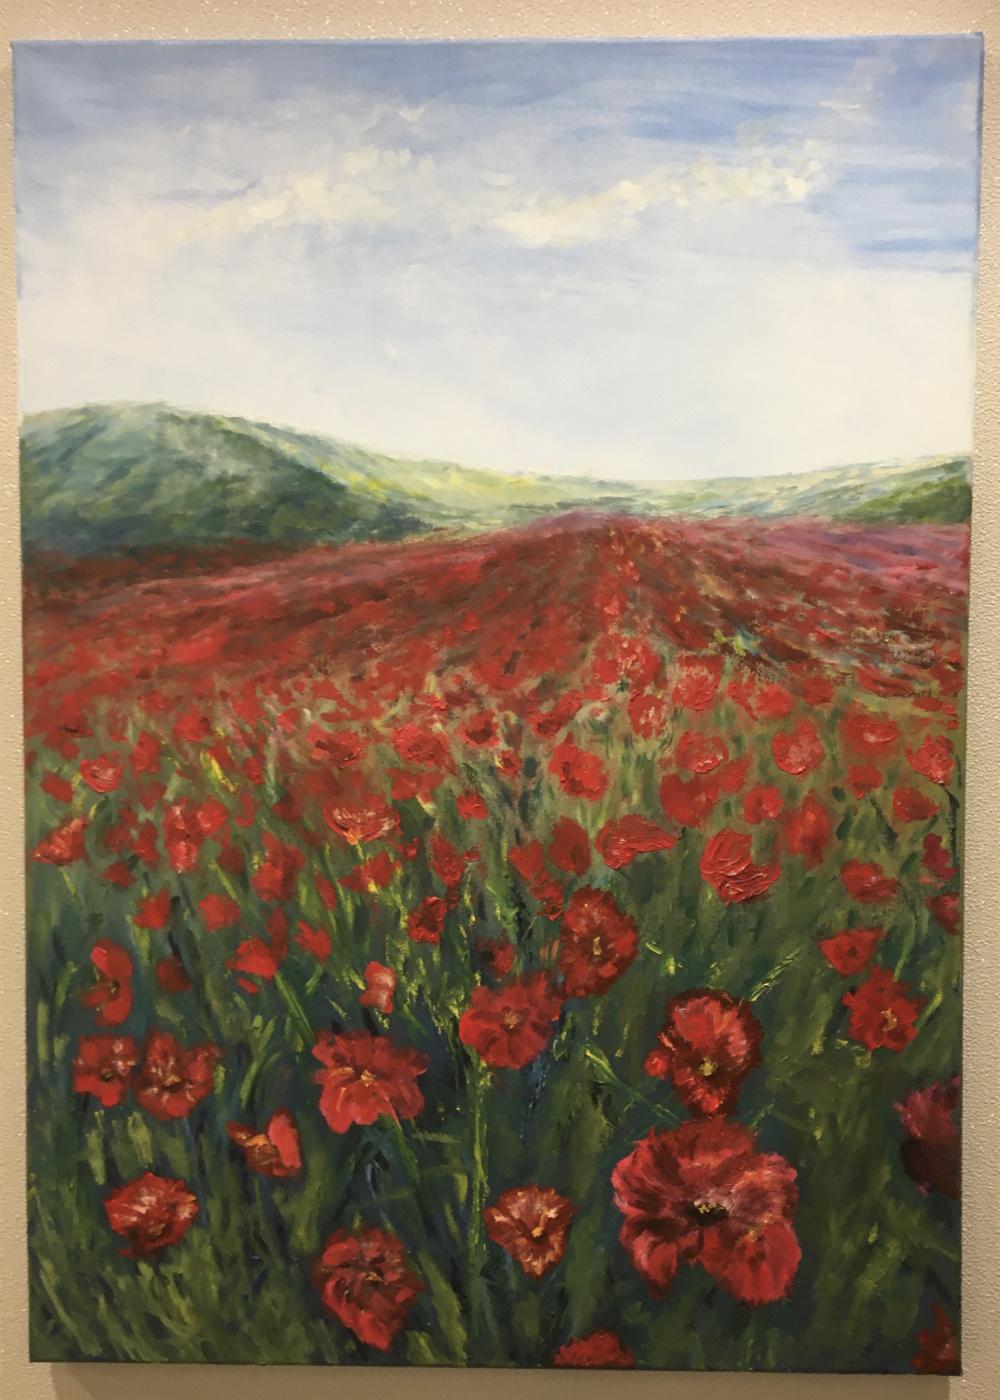 Mihails (Mikhail) Valentinovich Ribenko (Rybenko). Poppies of Kyrgyzstan